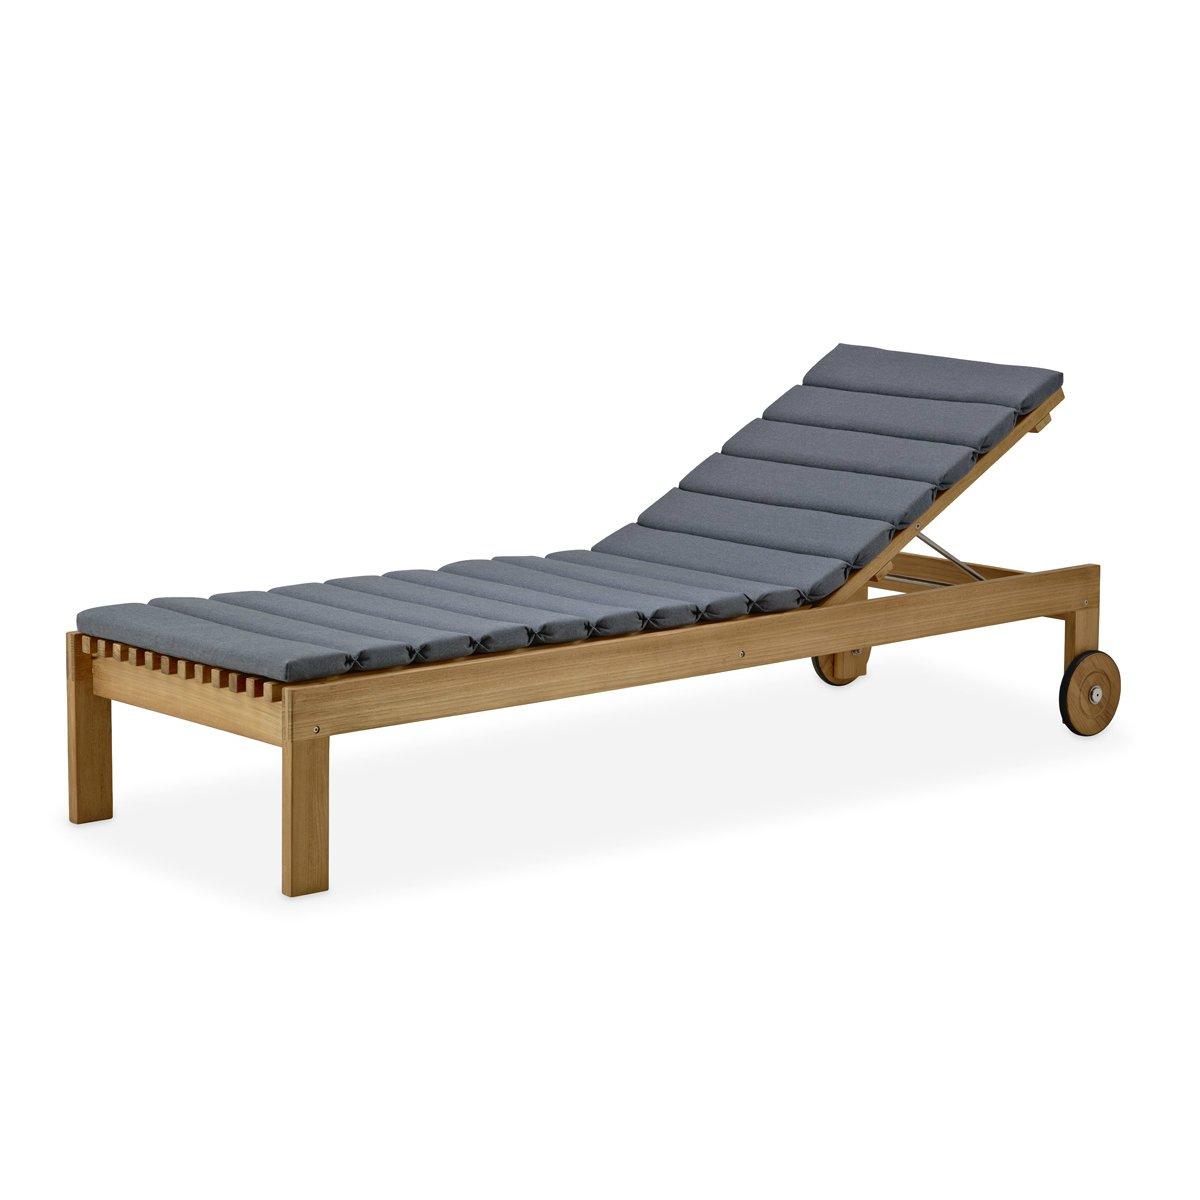 cane line amaze sonnenliege. Black Bedroom Furniture Sets. Home Design Ideas